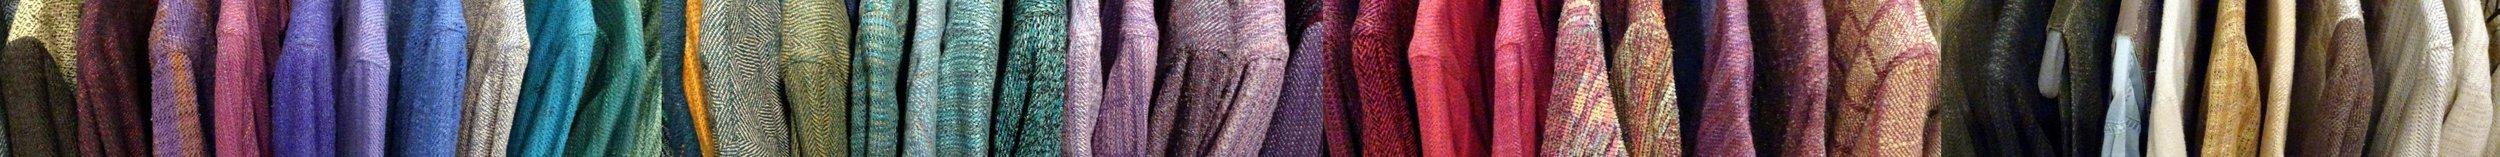 Liz Spear Hand Woven, Art-To-Wear, Clothing-017.jpg